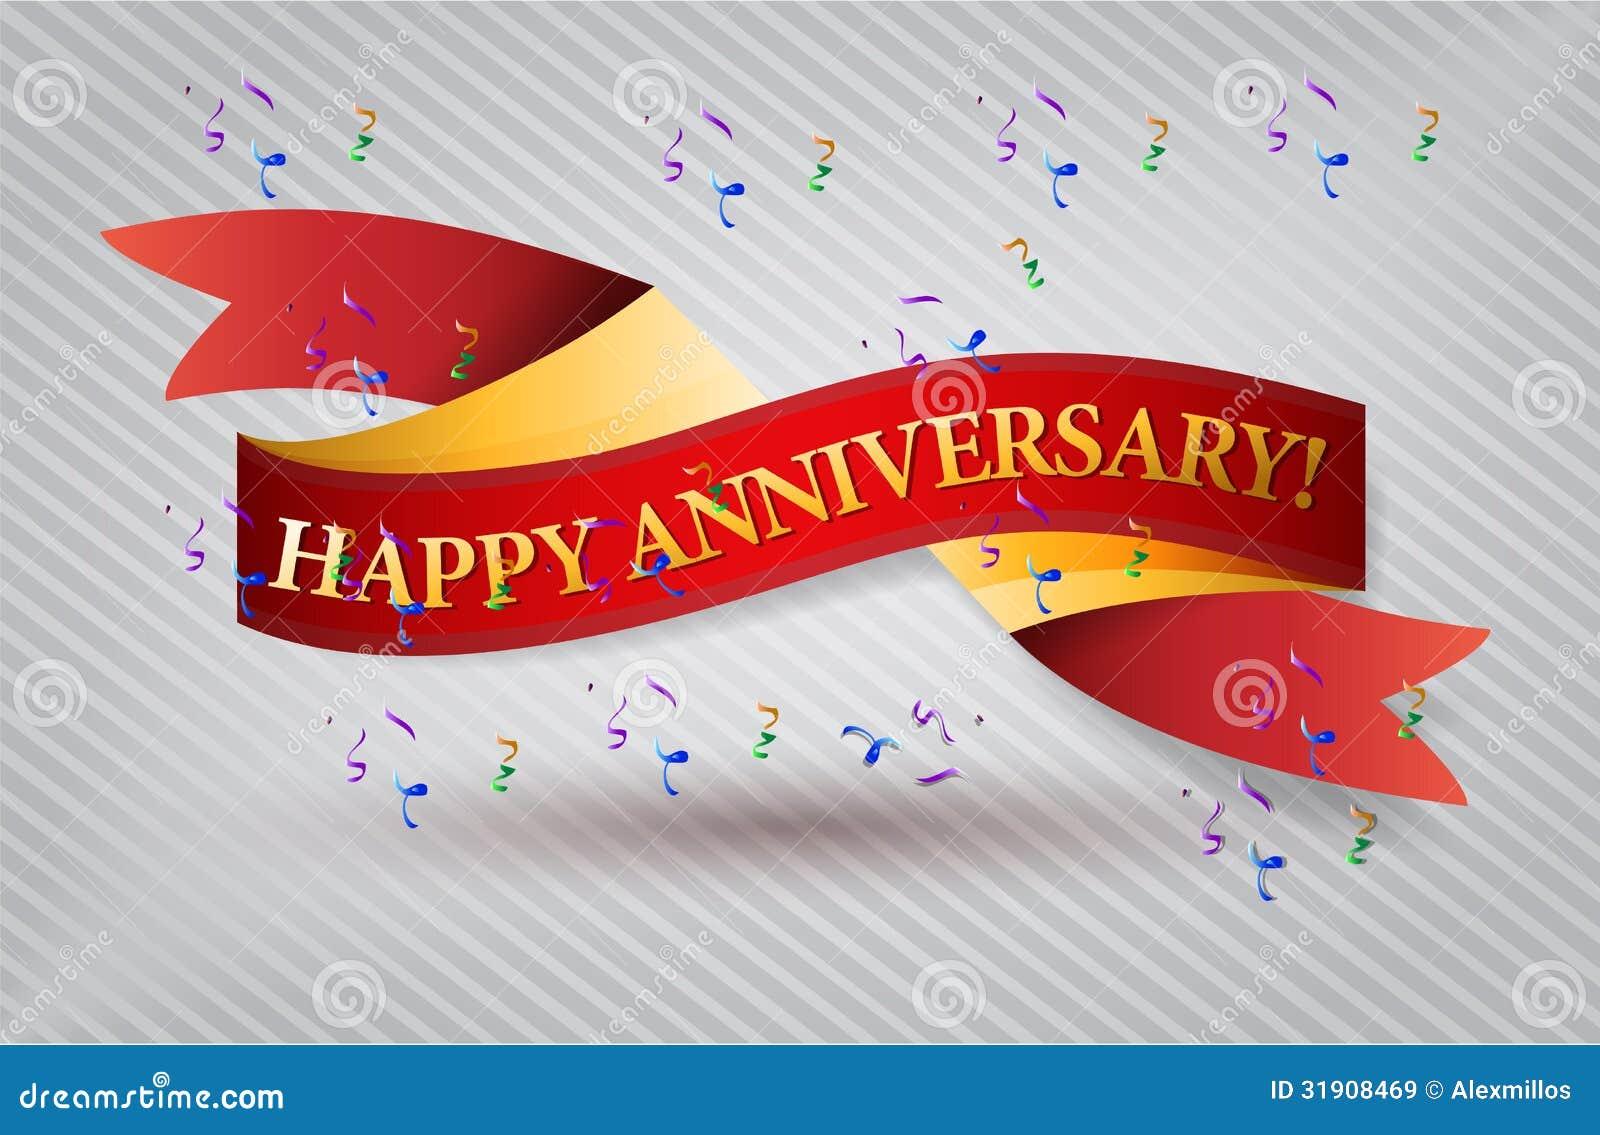 Happy anniversary red waving ribbon banner royalty free